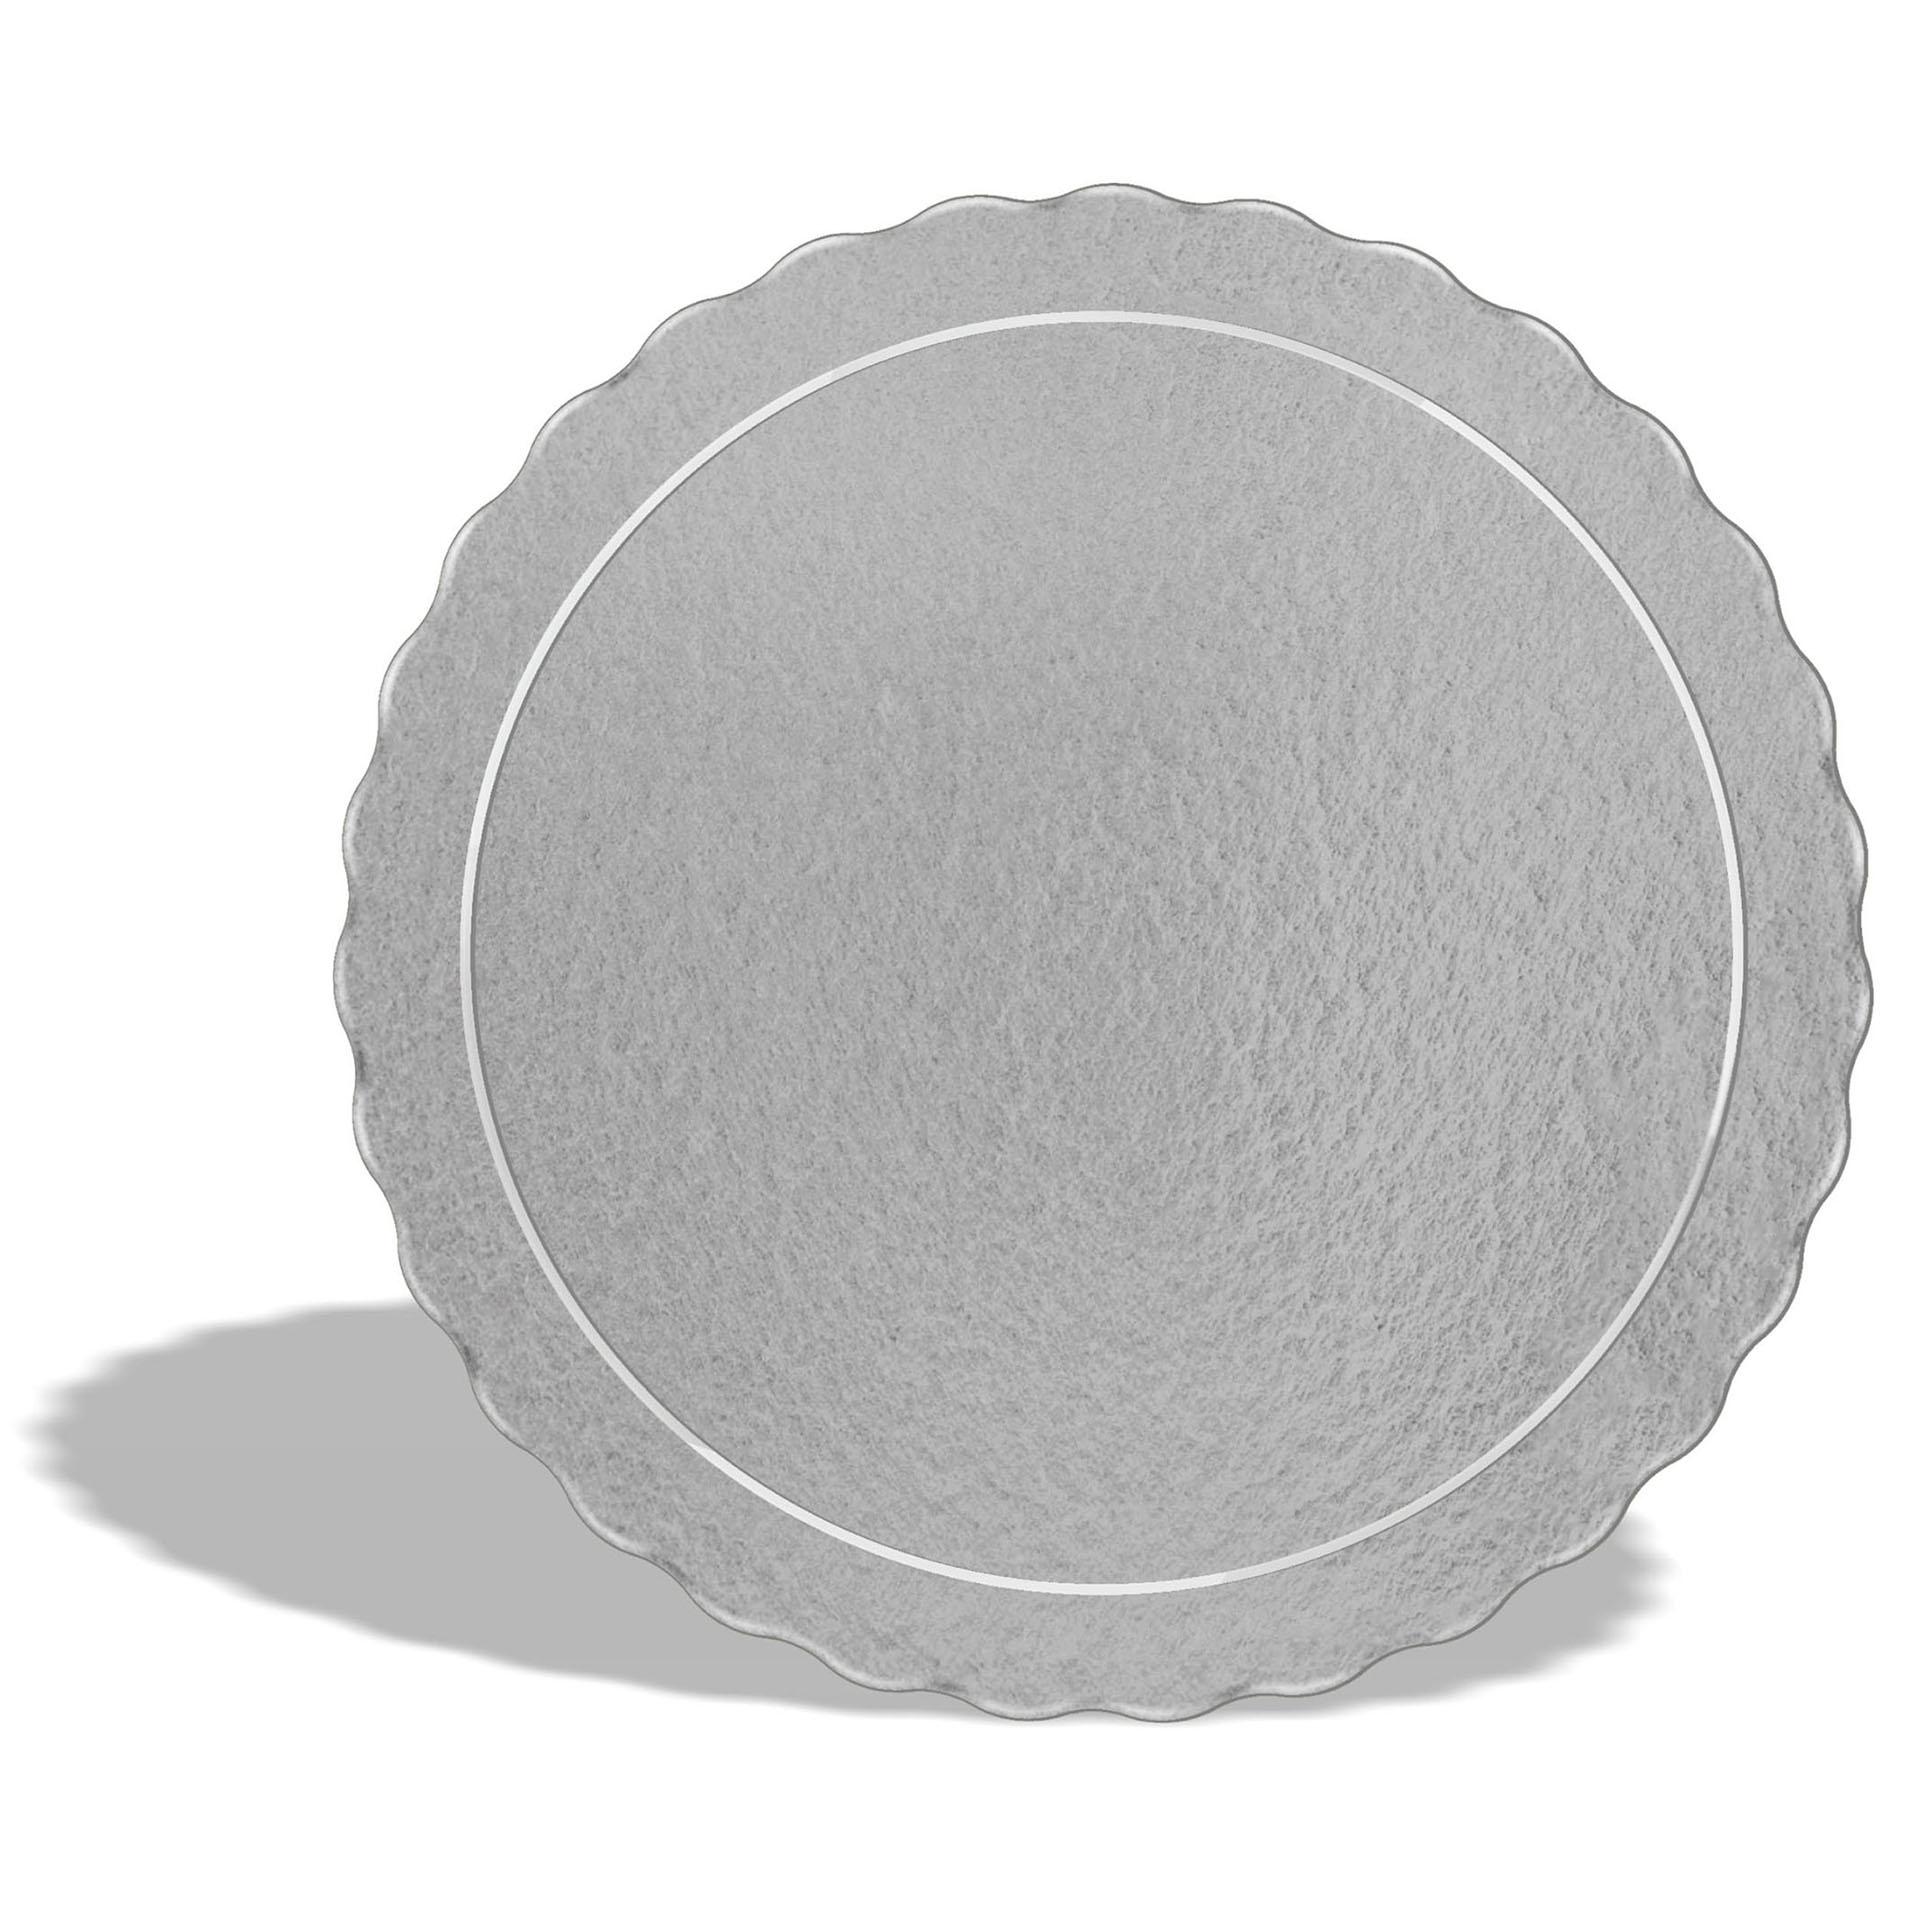 Kit 60 Bases Laminadas Para Bolo, Cake Board, 25 e 32cm - Prata